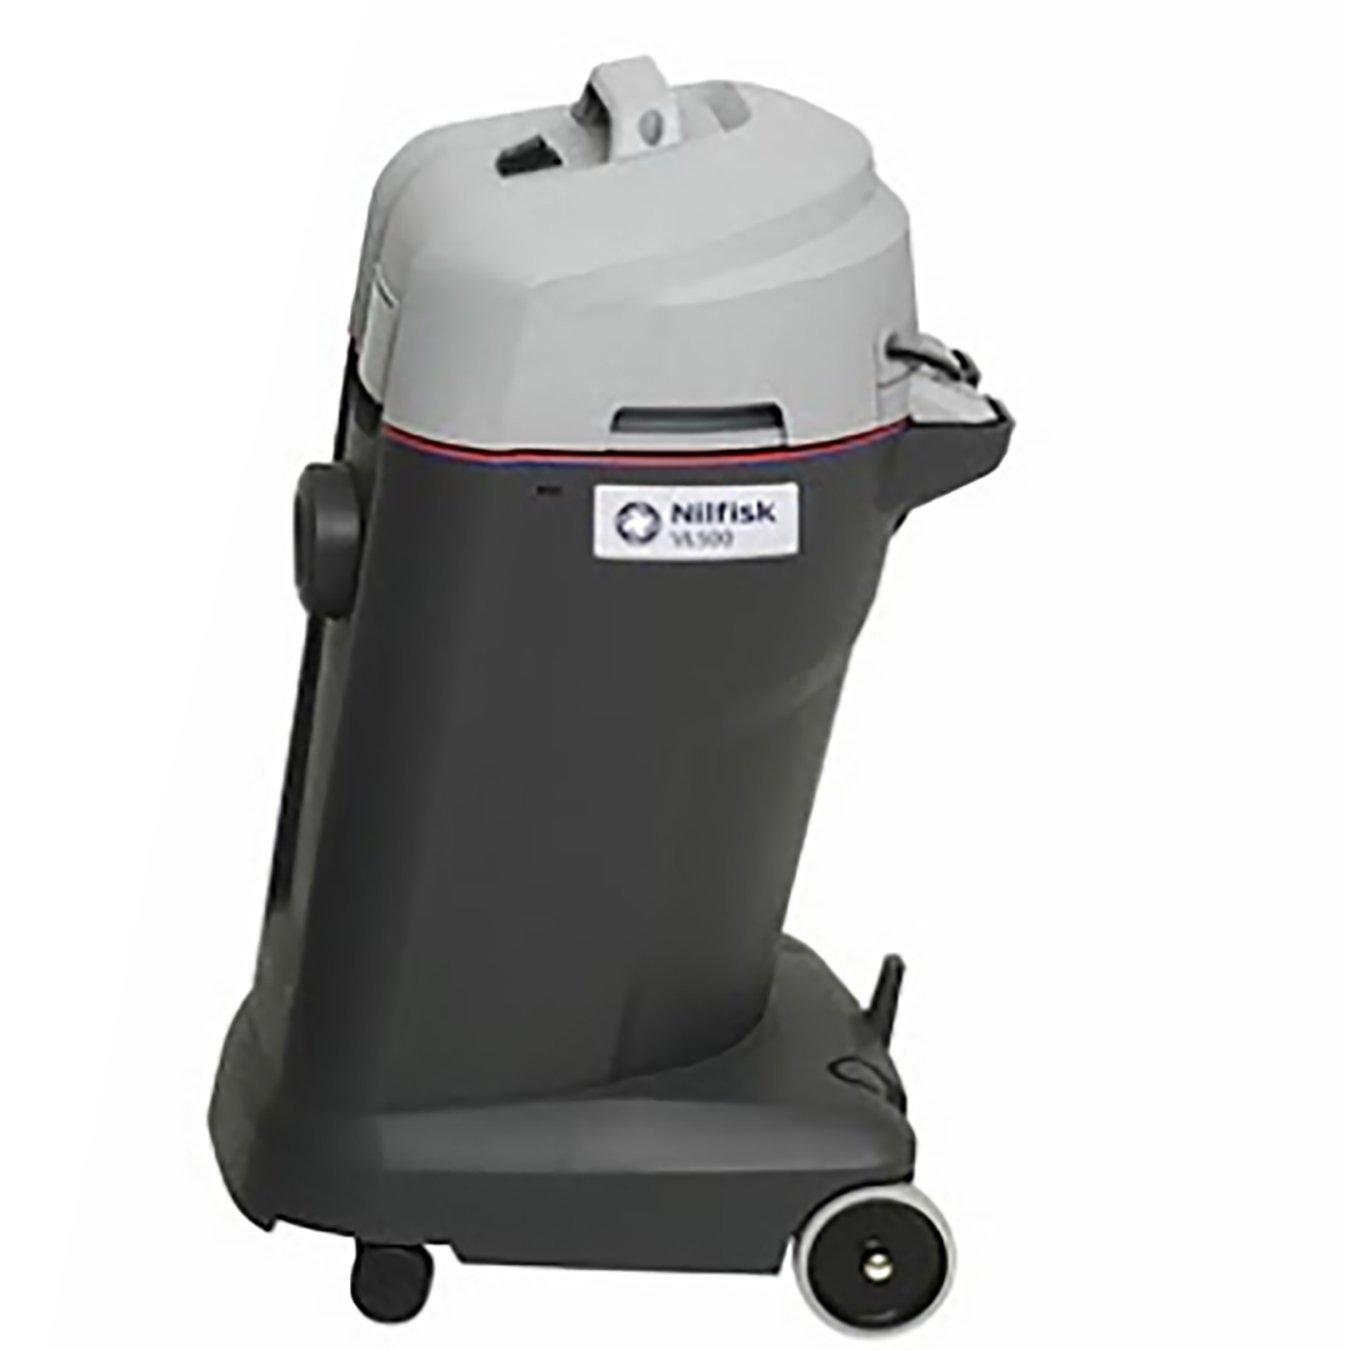 Advance VL500 35-9 Gal Wet/Dry Vacuum Model Number 107409094, Gray